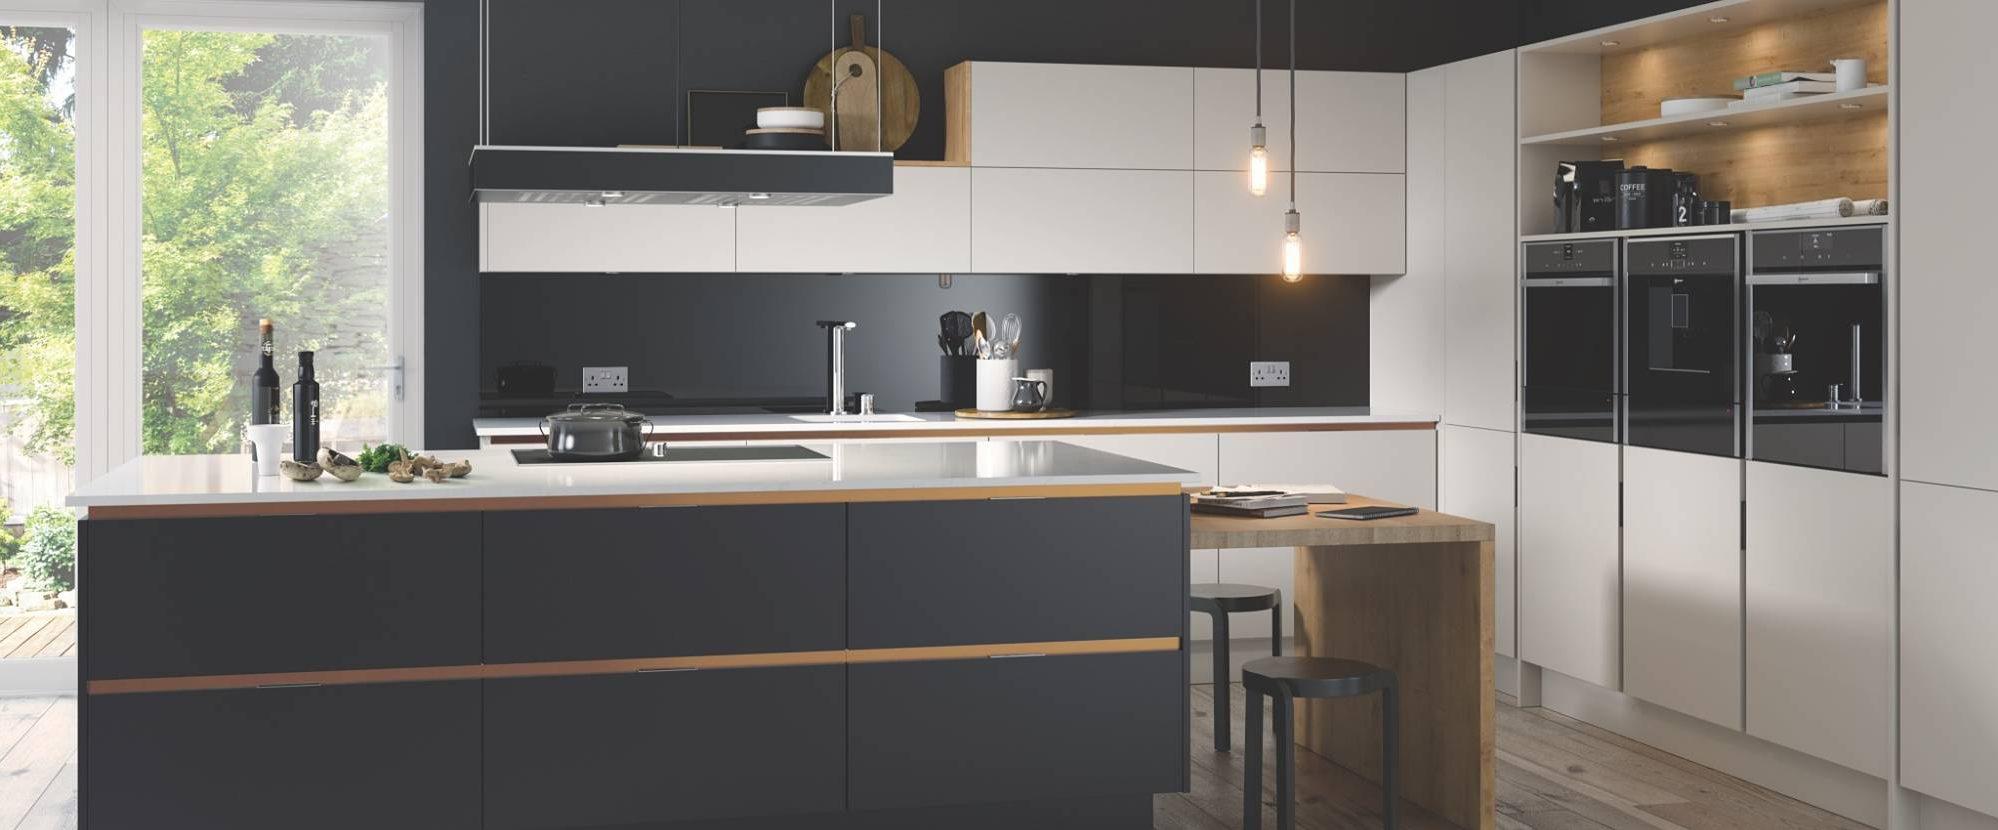 Inset Setosa Anthracite and Limestone Copper Trim Contemporary Kitchen